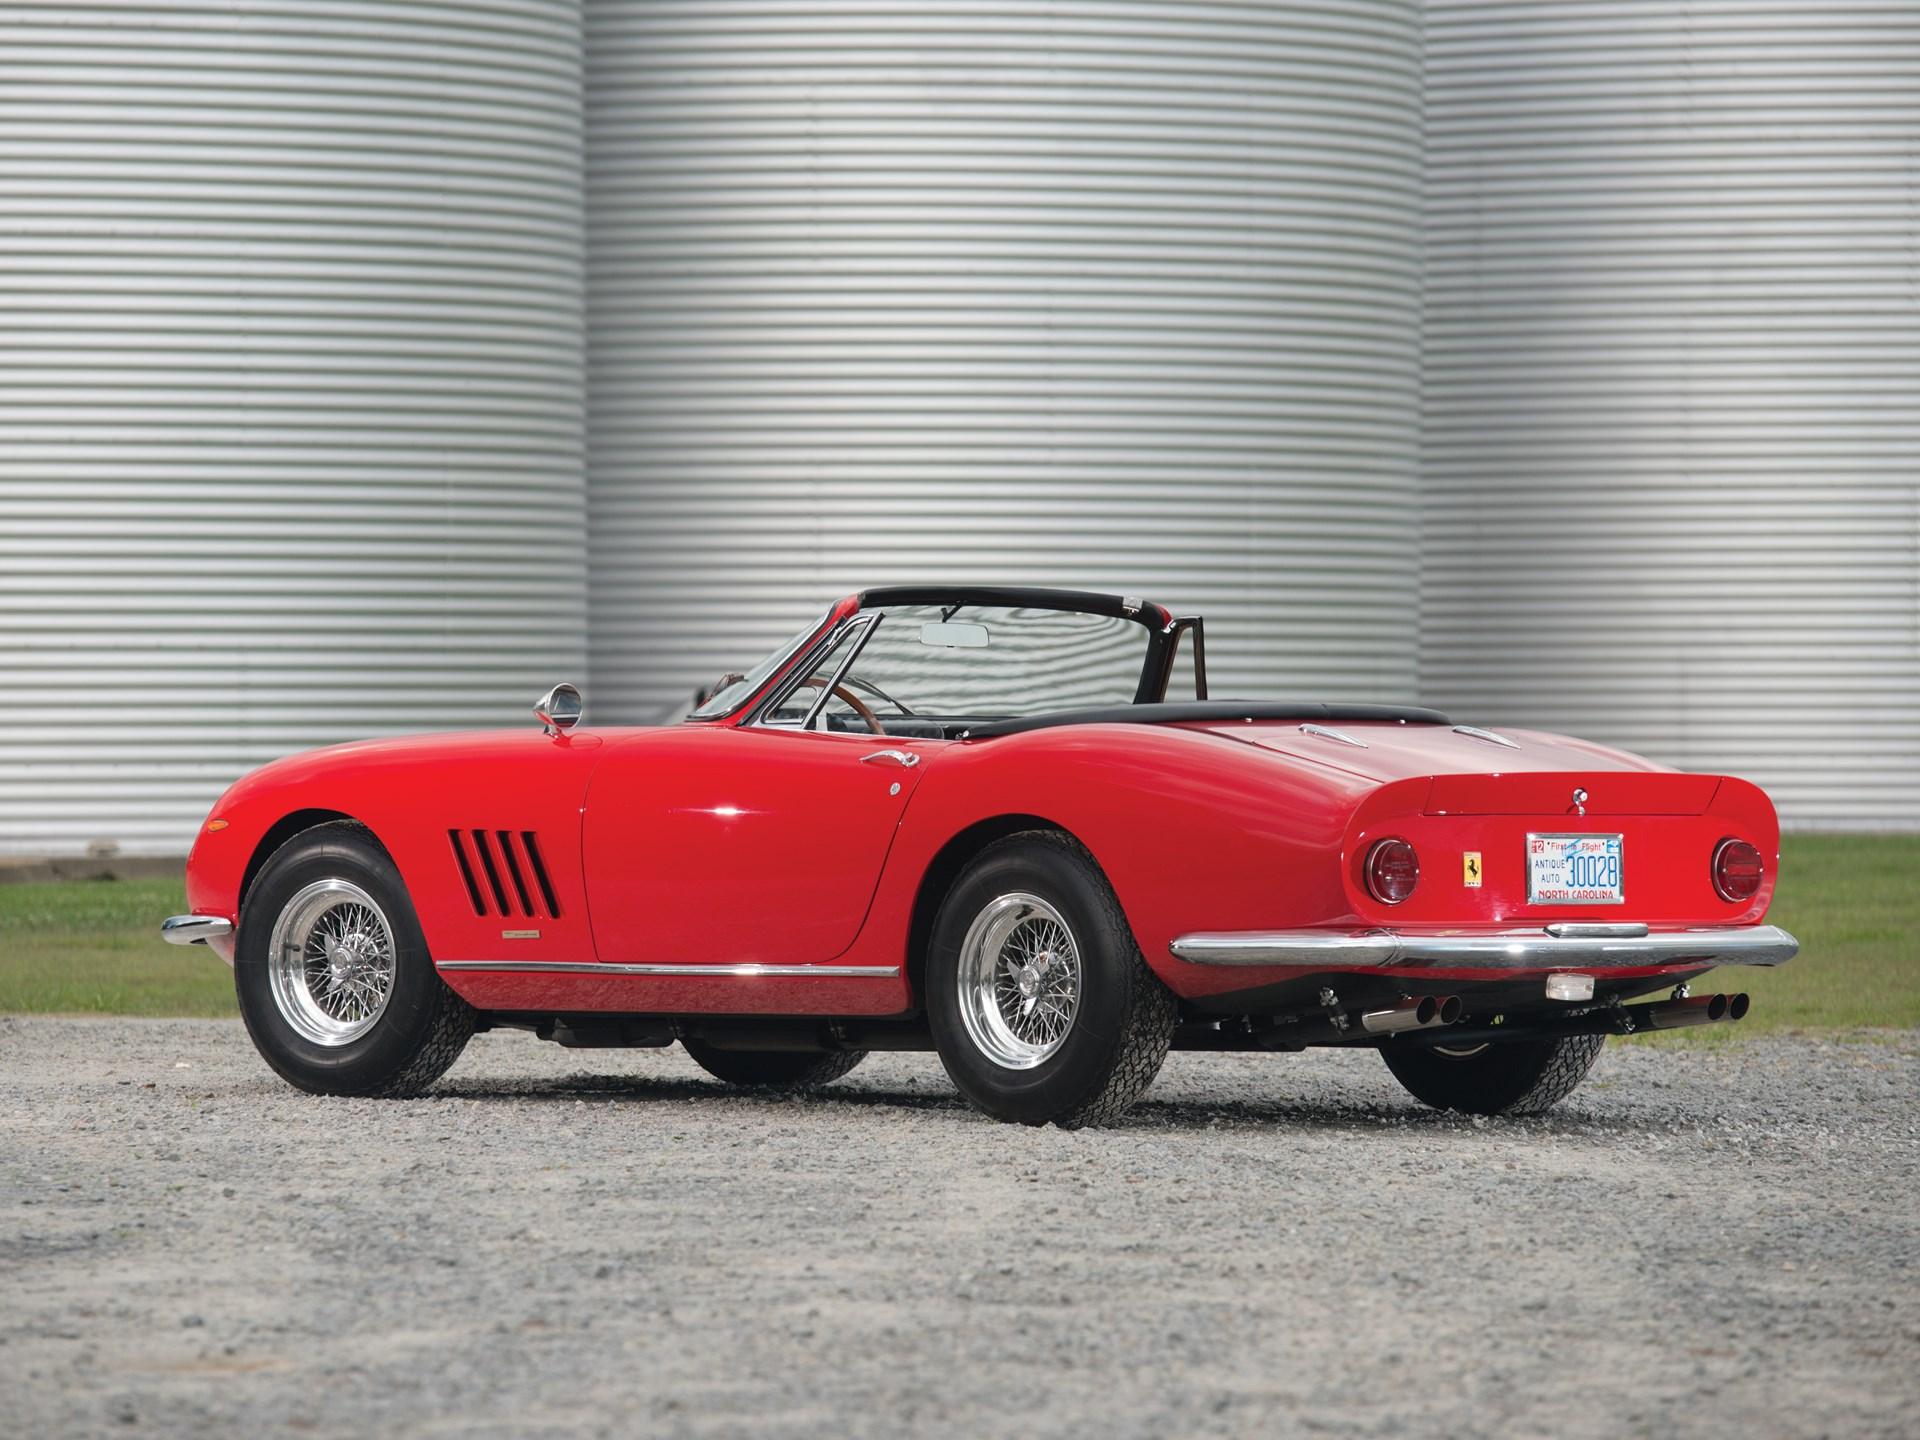 RM Sotheby's - 1967 Ferrari 275 GTB/4*S N.A.R.T. Spider by ...